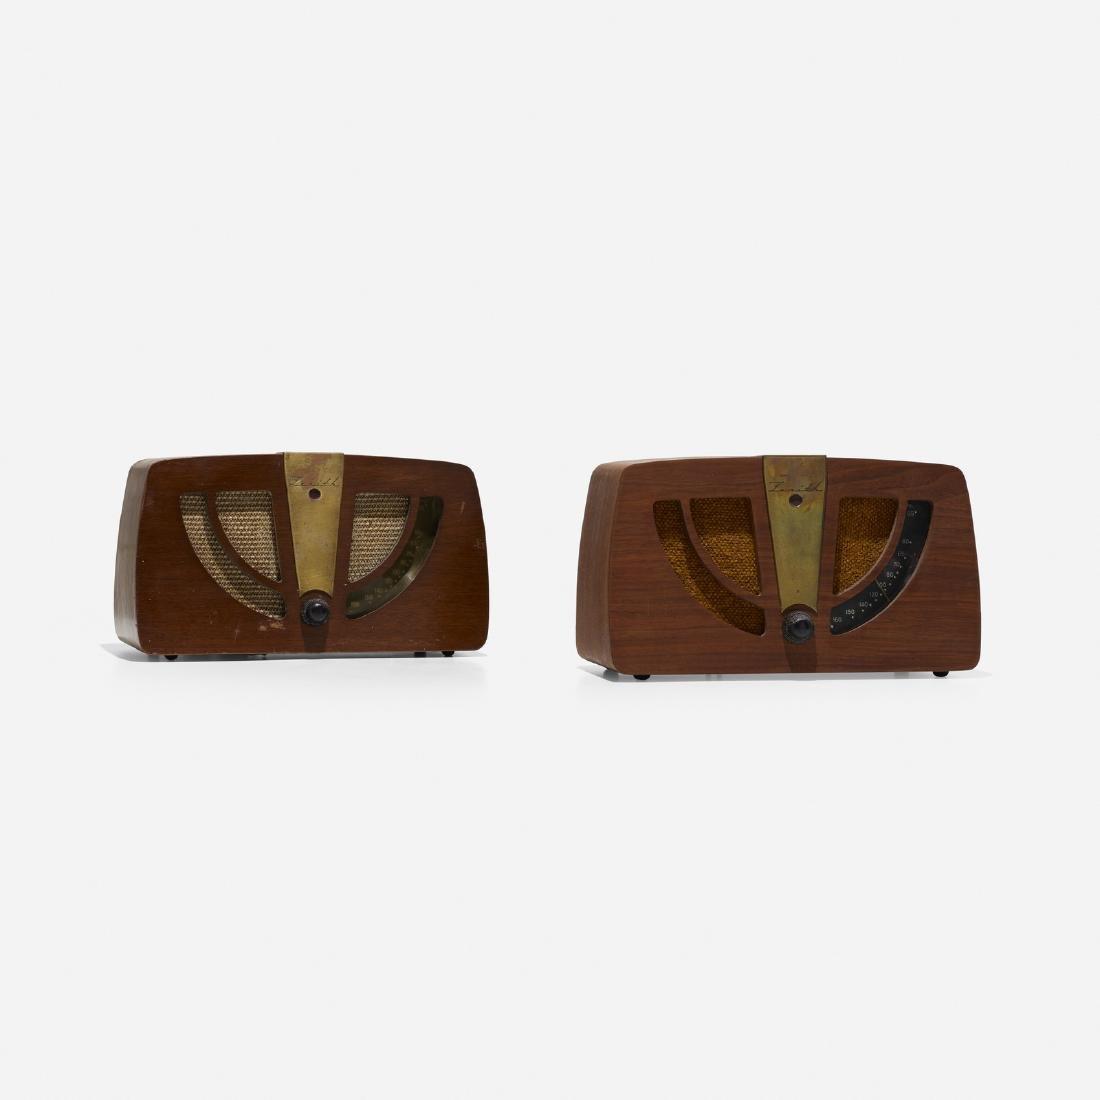 Charles and Ray Eames, radios model 6D030, pair